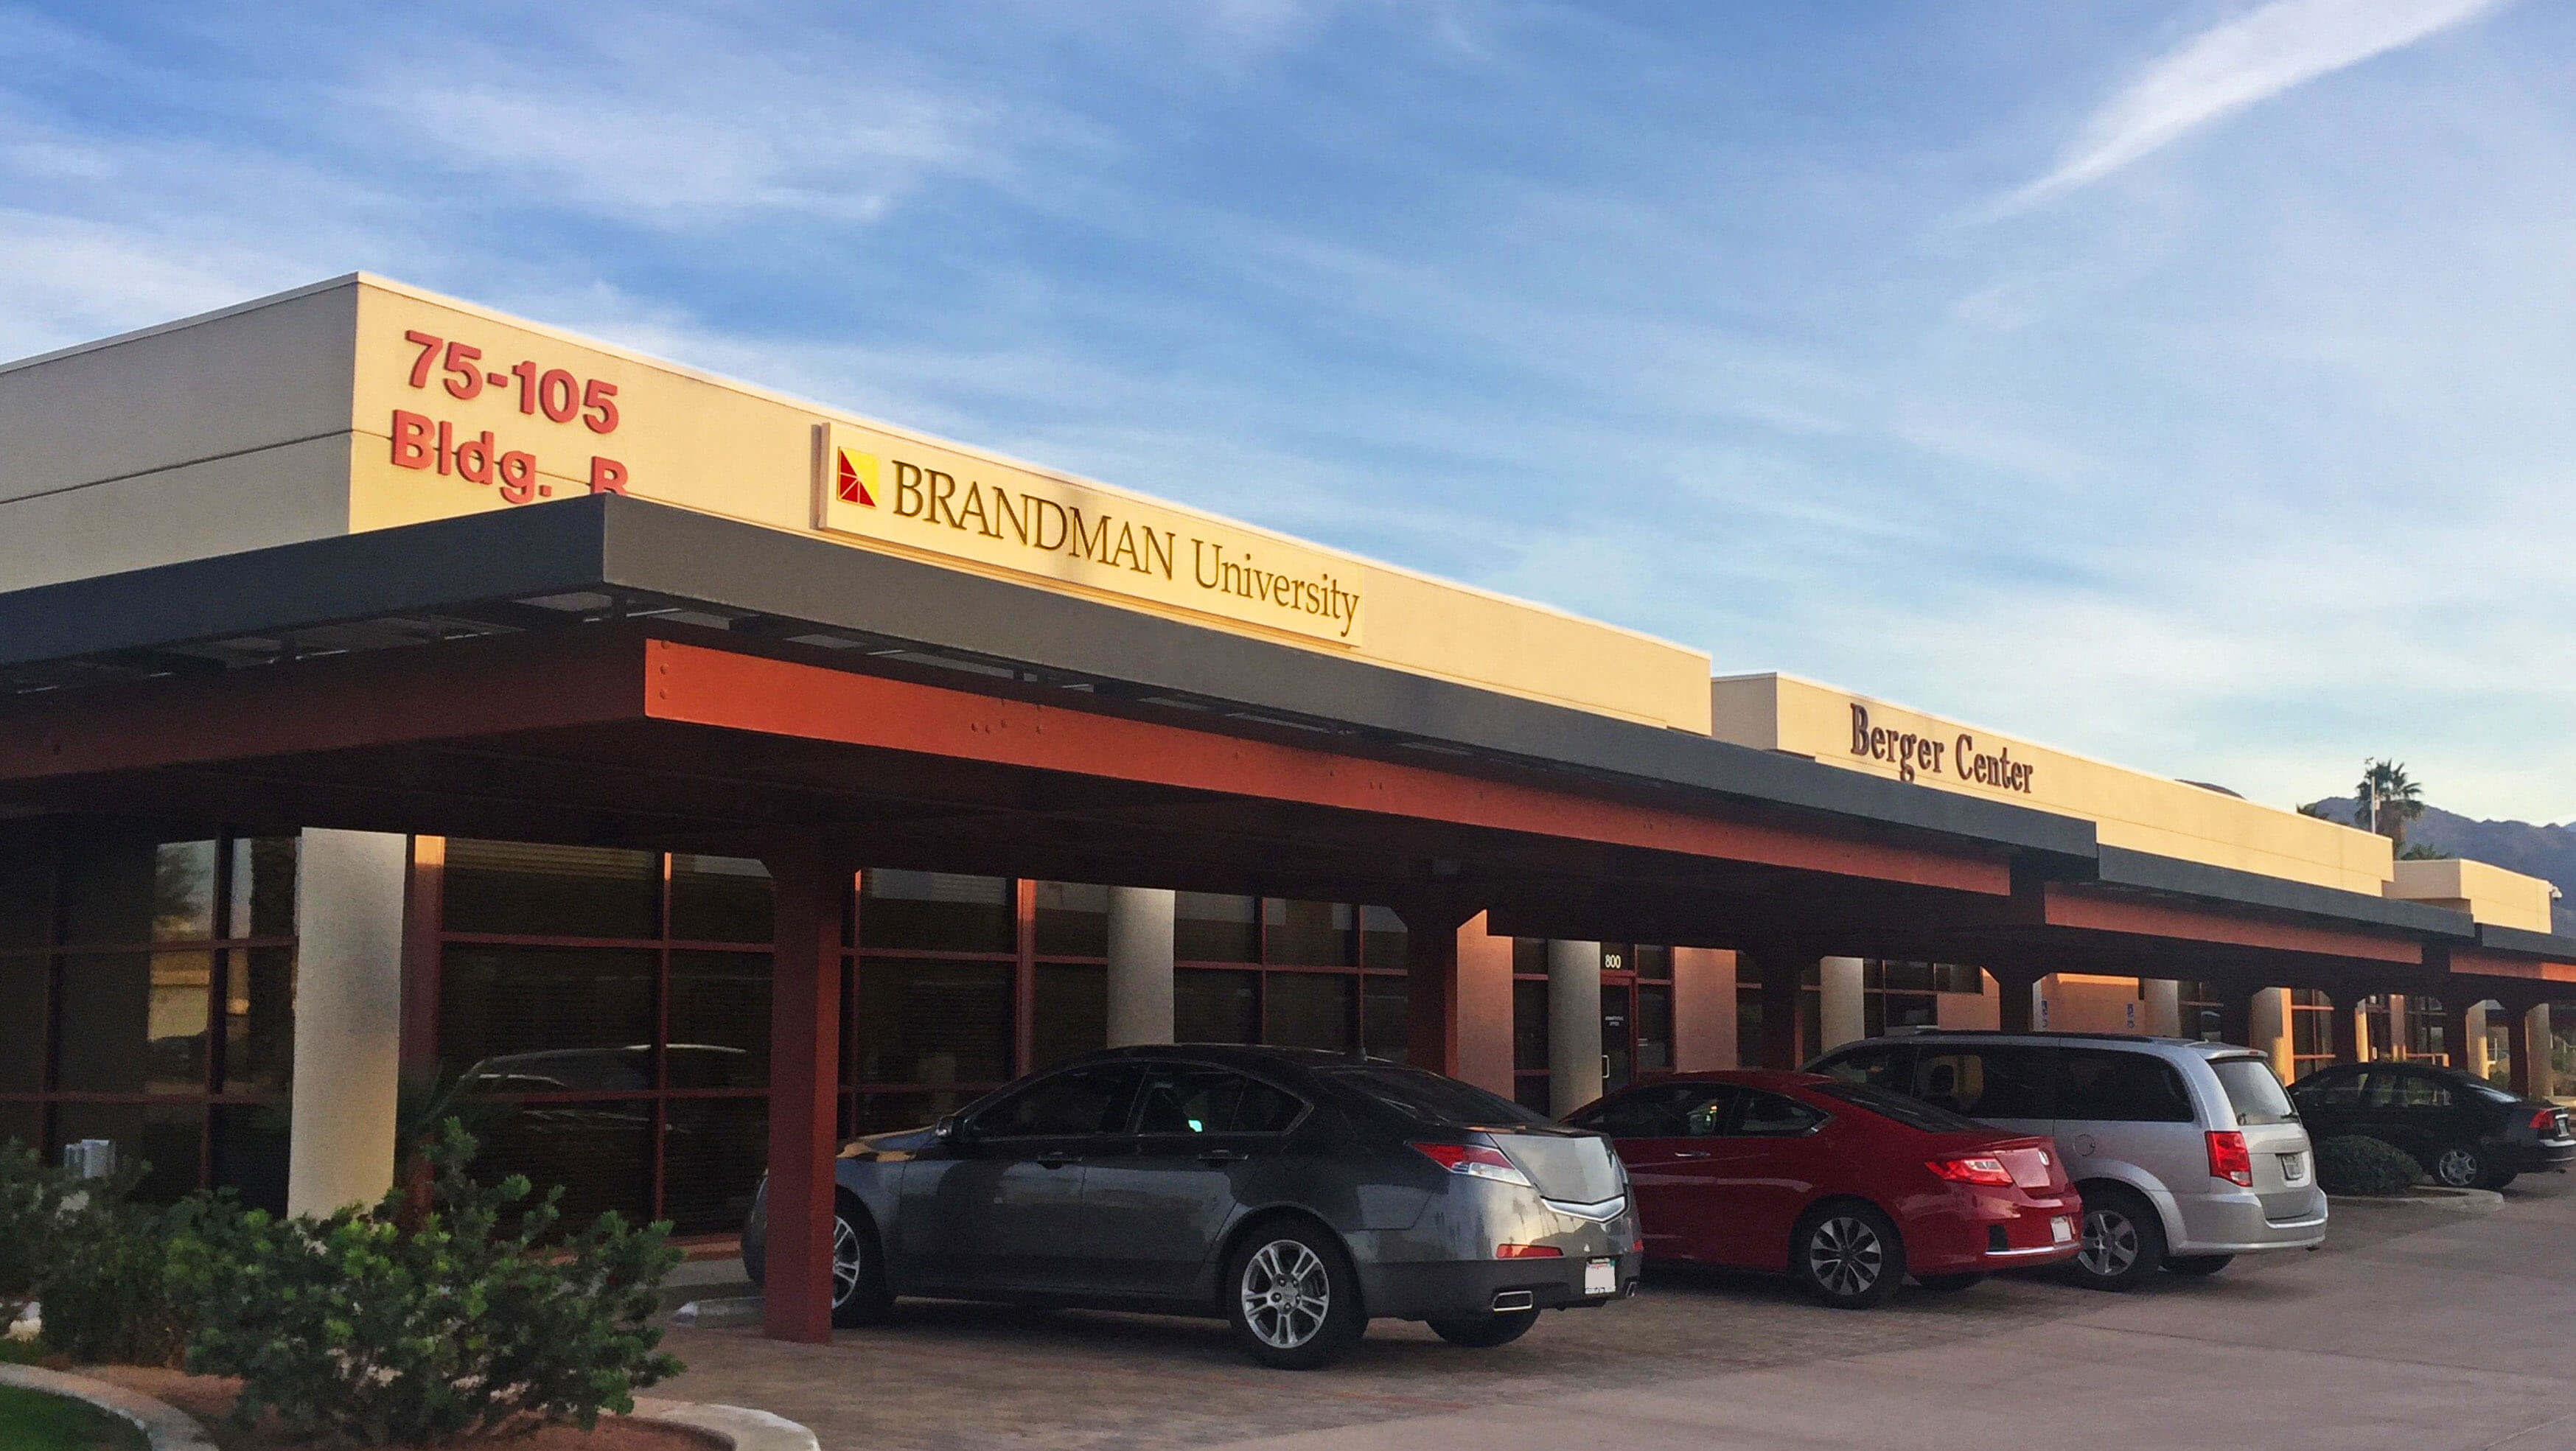 Chapman / Brandman University - Palm Desert